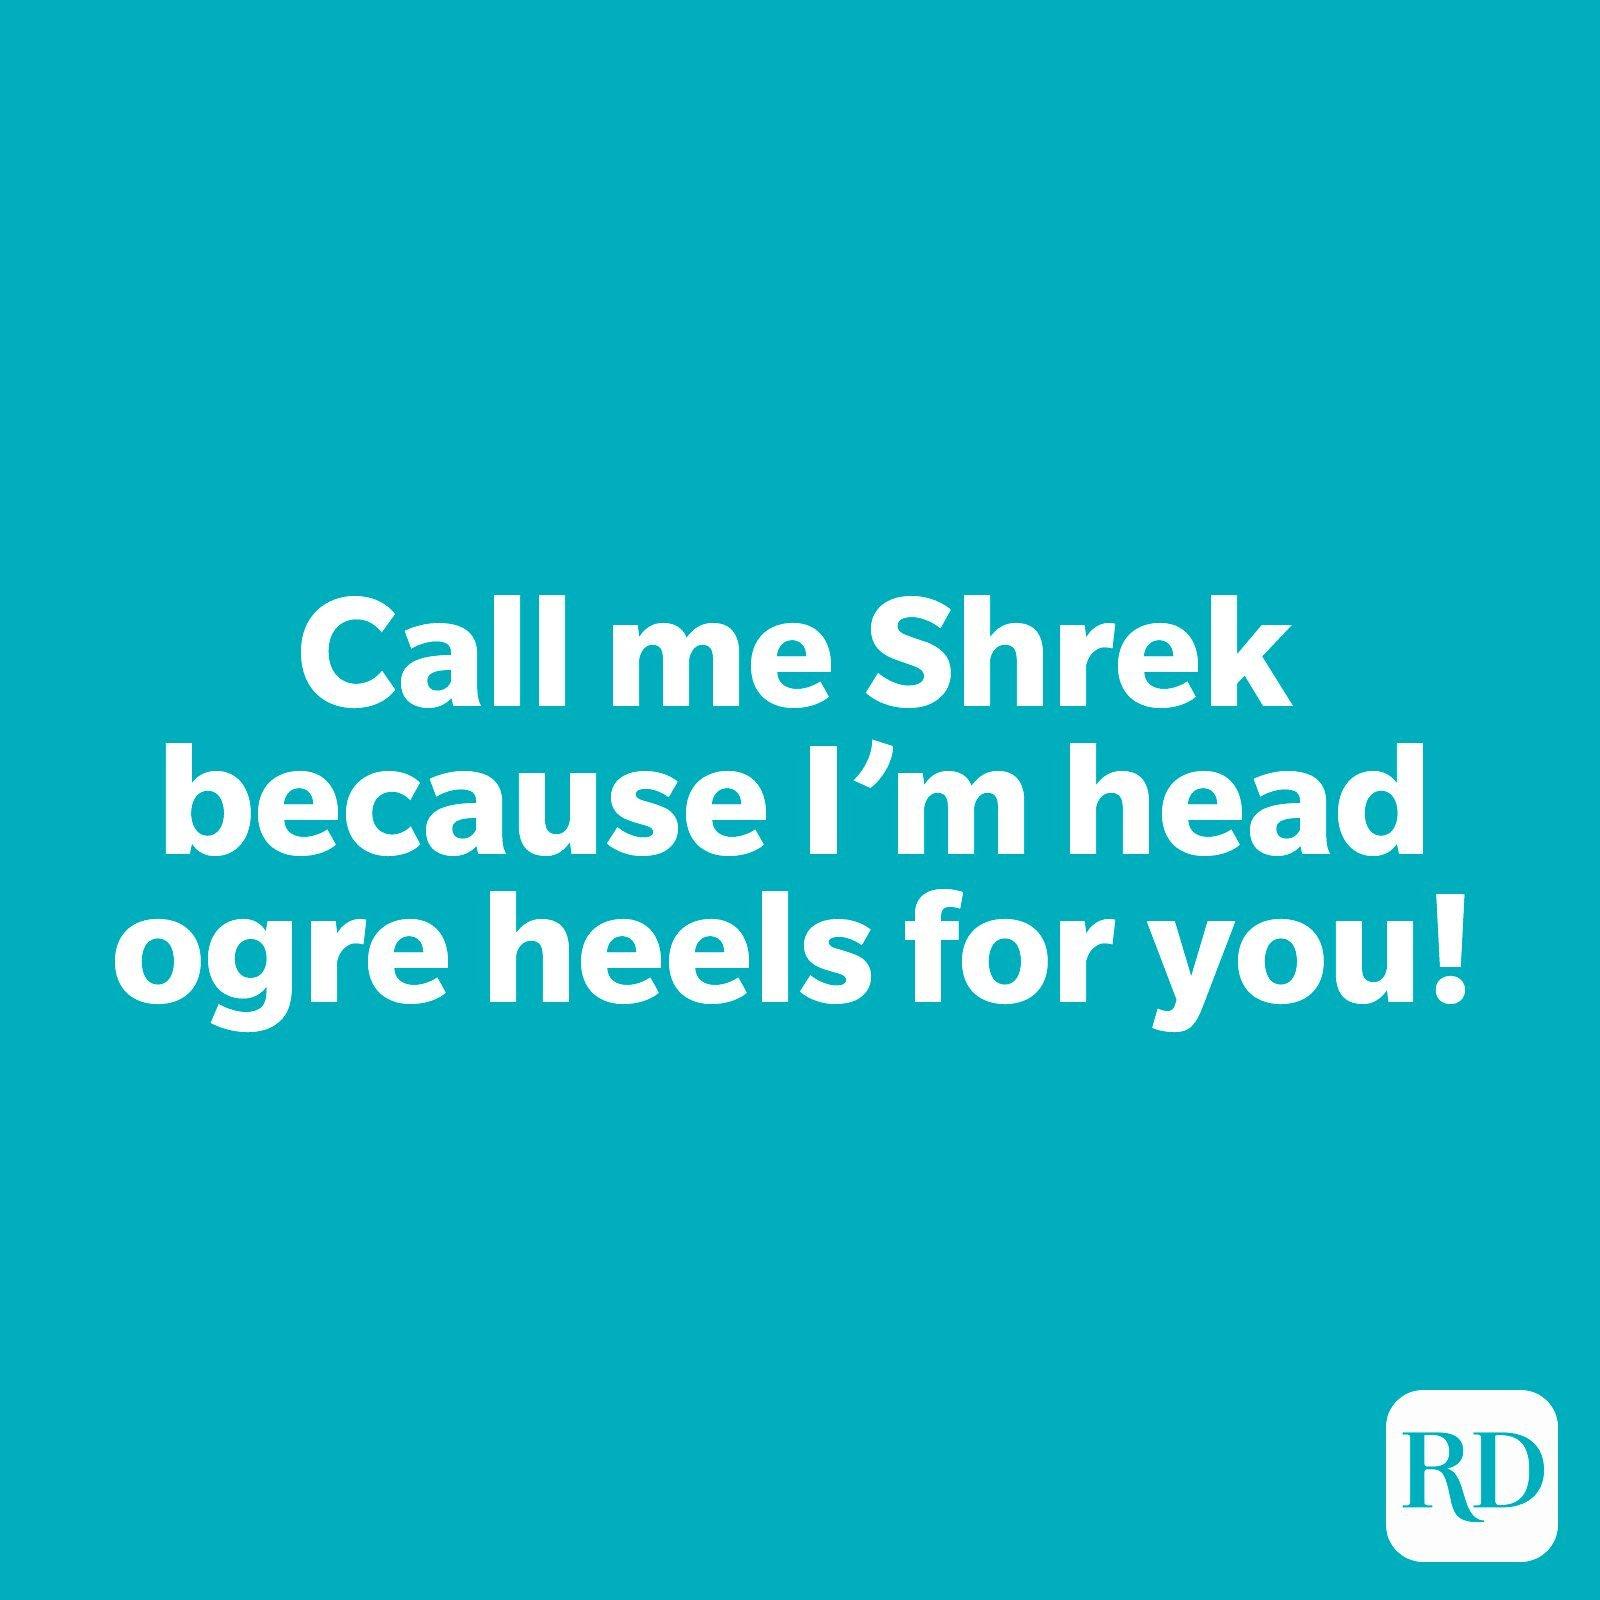 Call me Shrek because I'm head ogre heels for you!